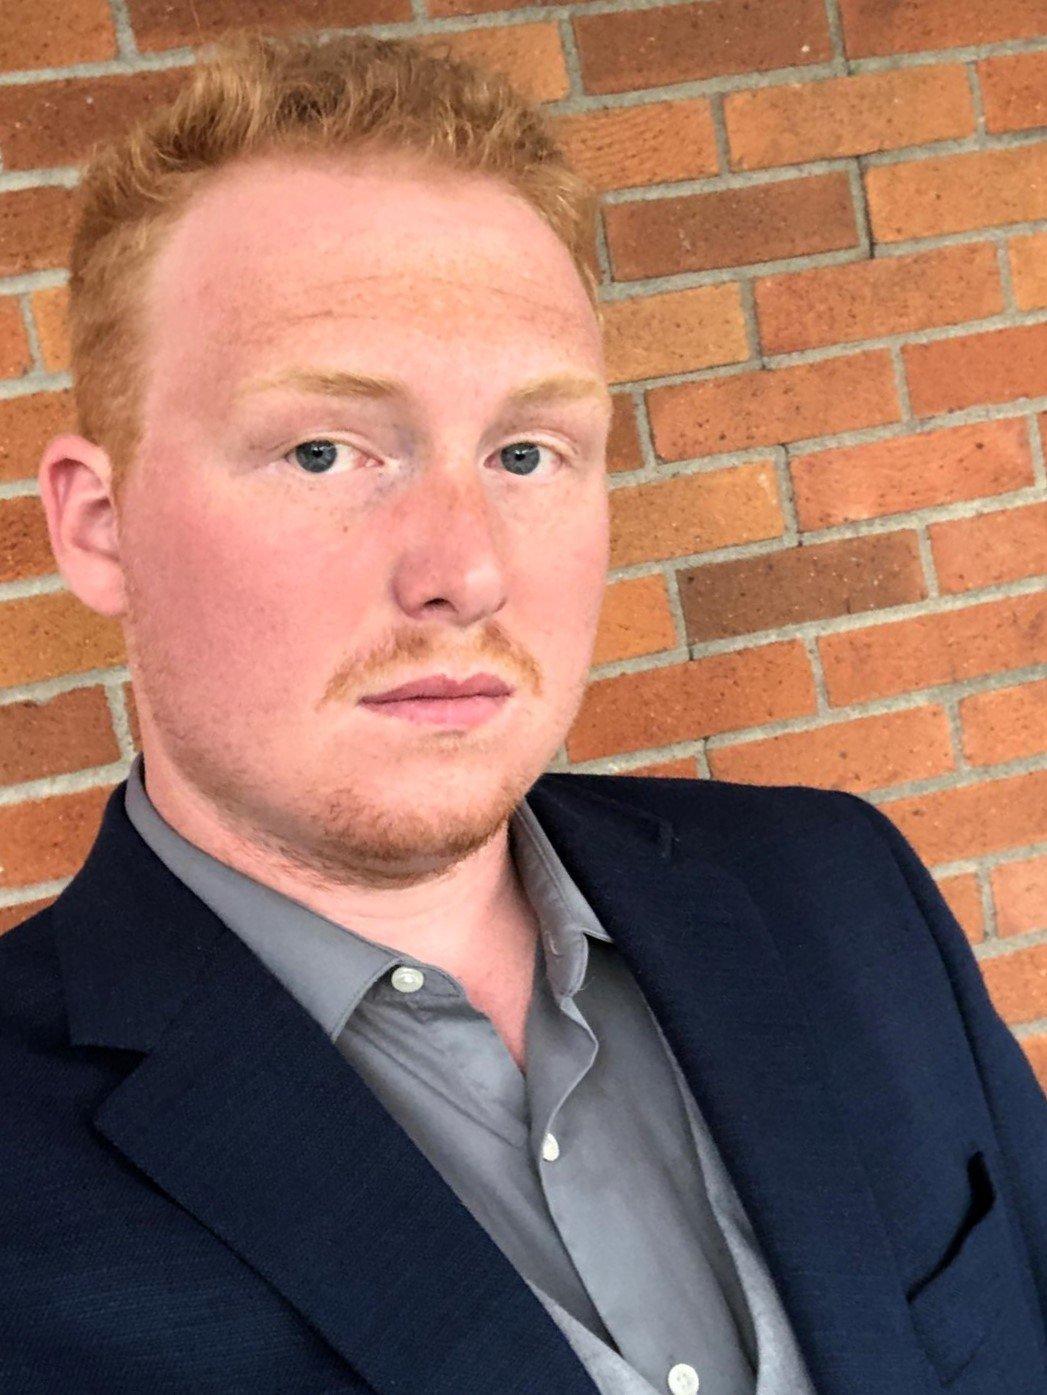 Jacob Davis de Davis Janitorial Services